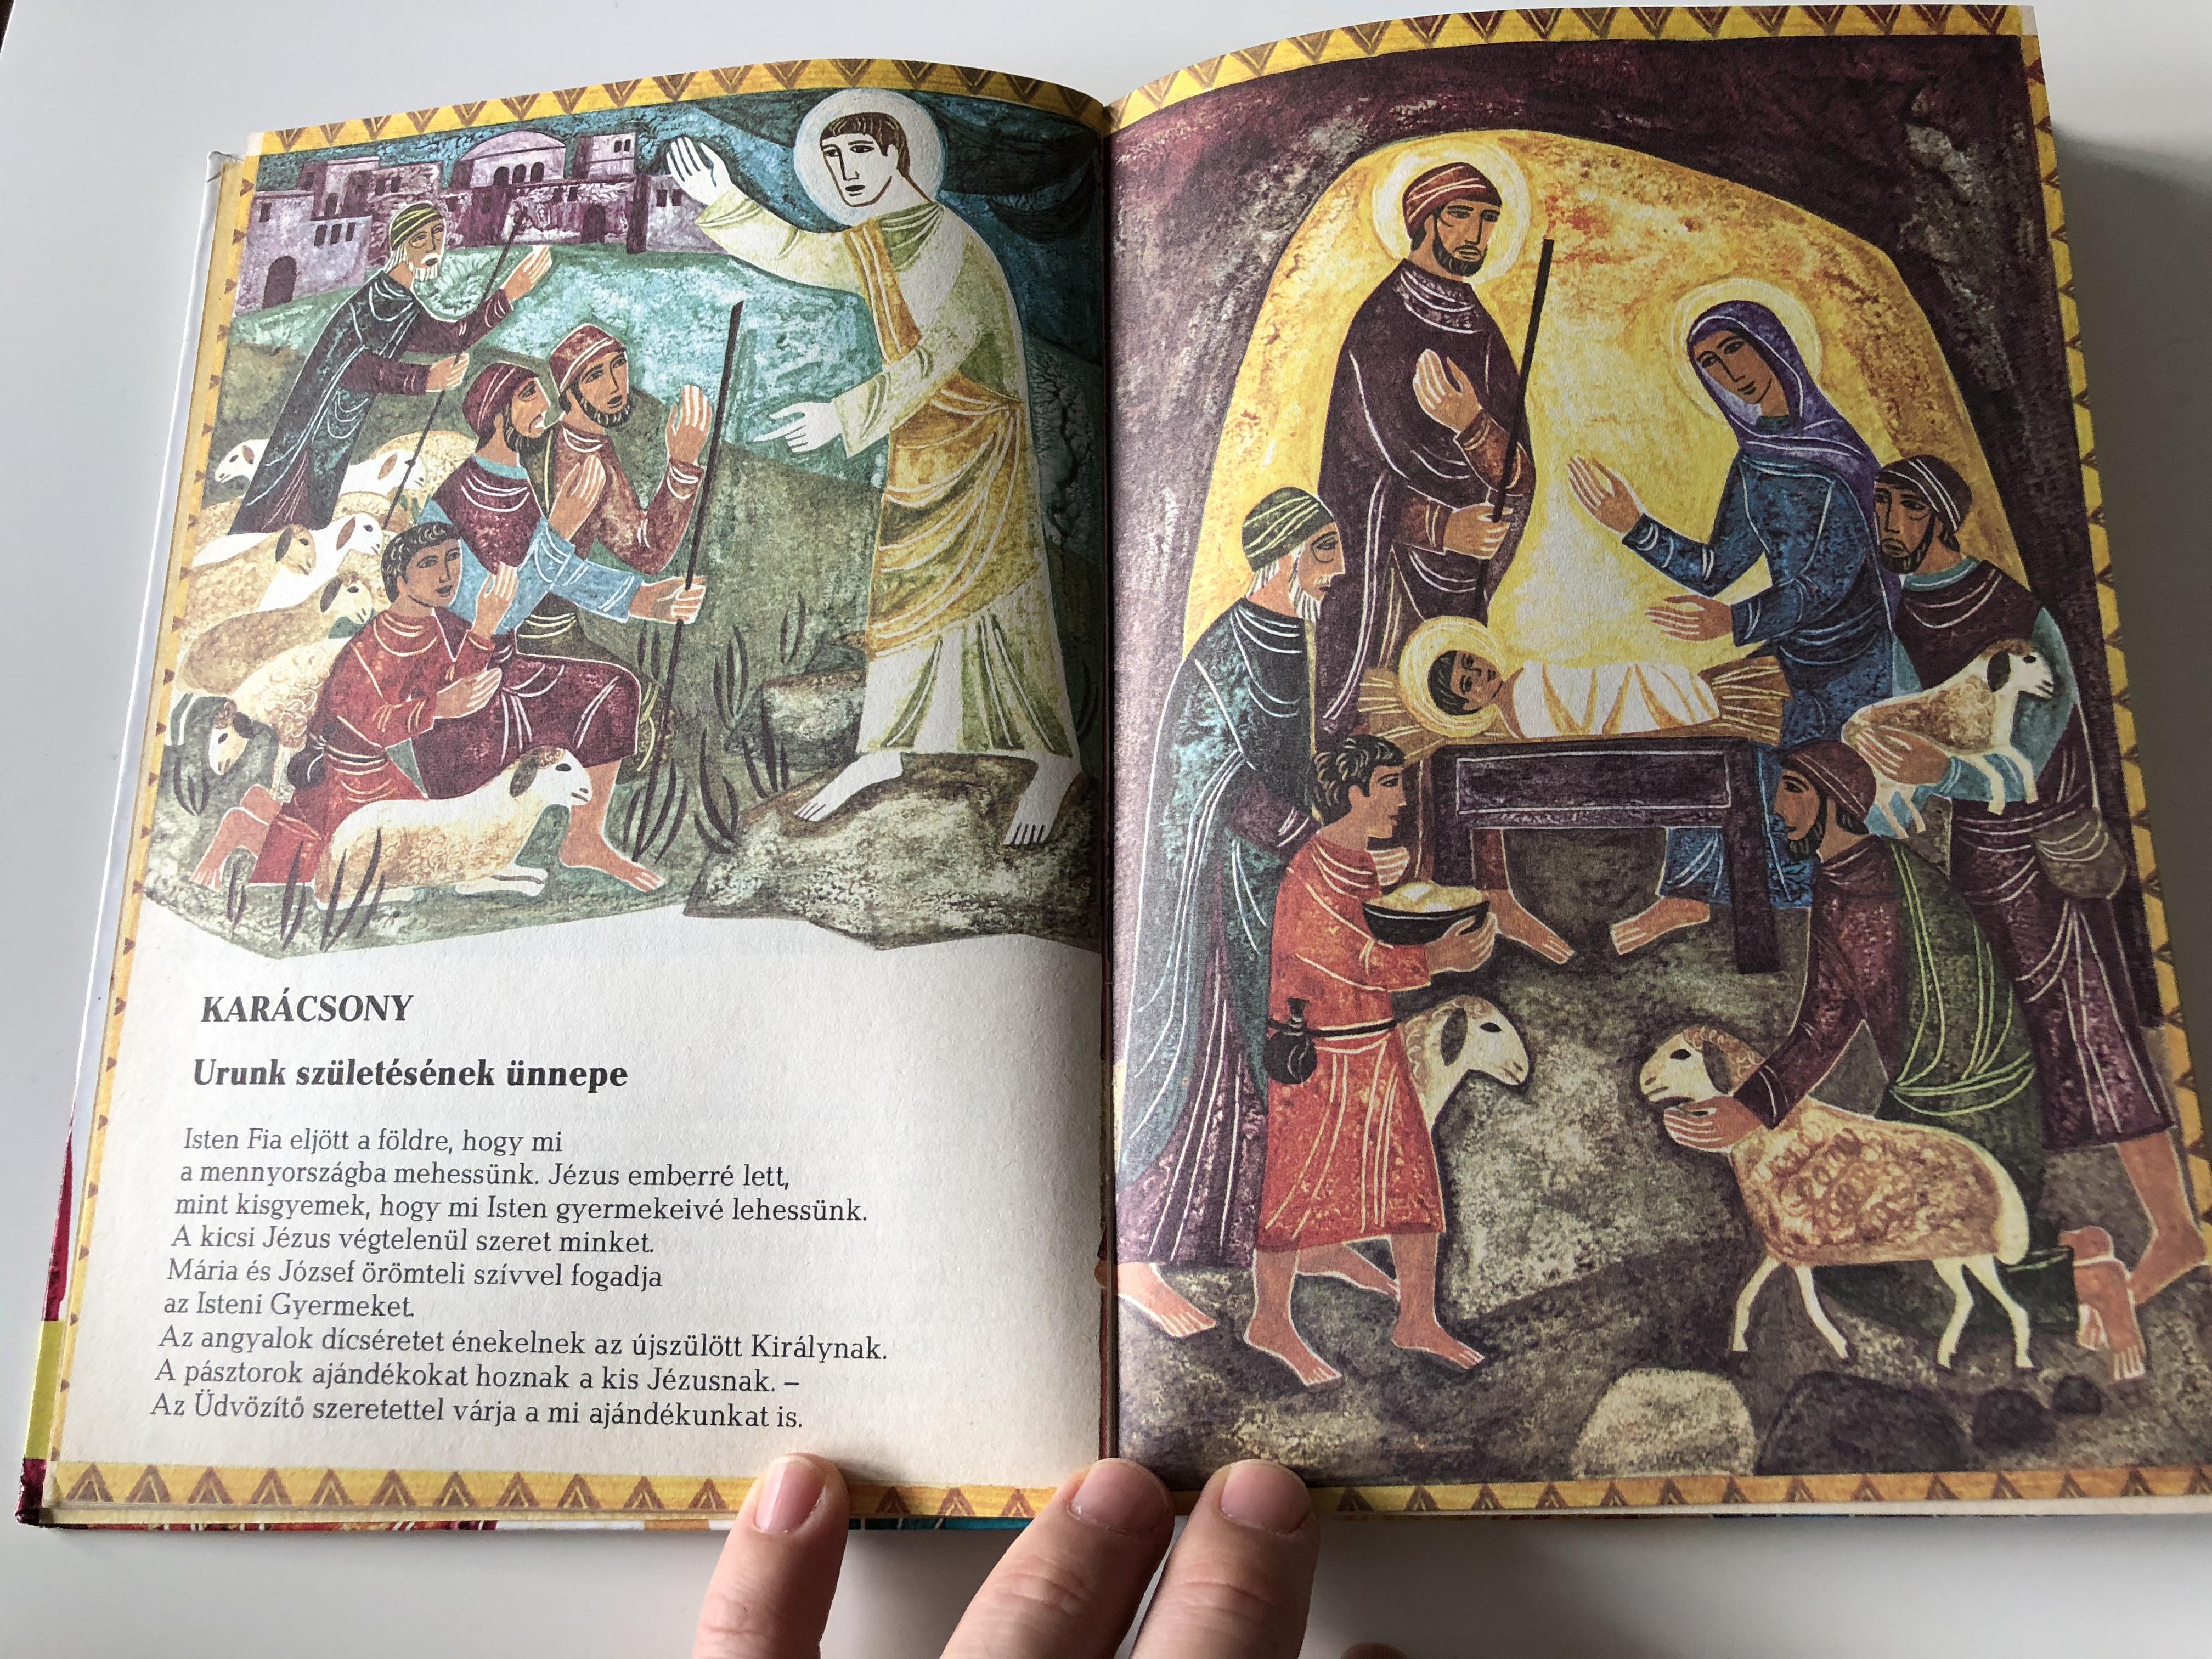 k-pes-evang-lium-by-k.-kammelberger-az-egyh-zi-v-nnepeire-s-vas-rnapjaira-hungarian-translation-of-bilderbibel-zum-neuen-kirchenjahr-illustration-h.-bledl-szent-istv-n-t-rsulat-8-.jpg